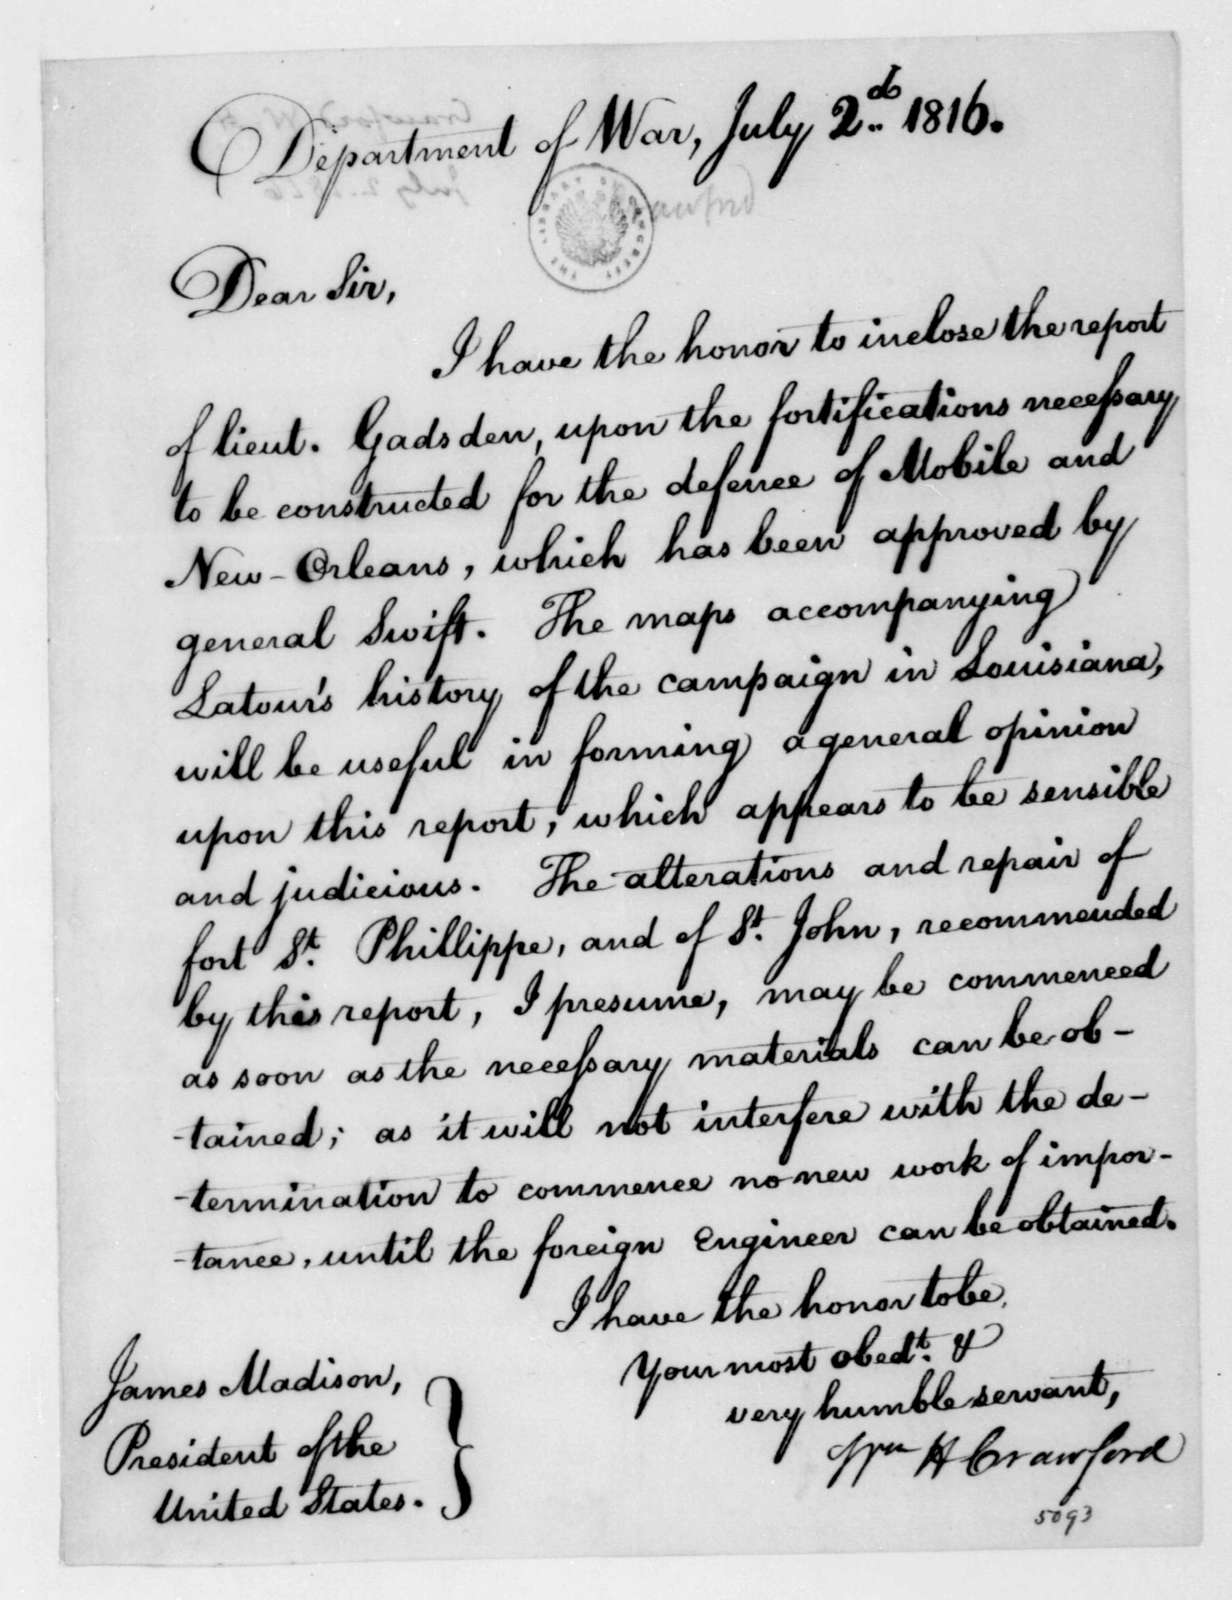 William H. Crawford to James Madison, July 2, 1816.